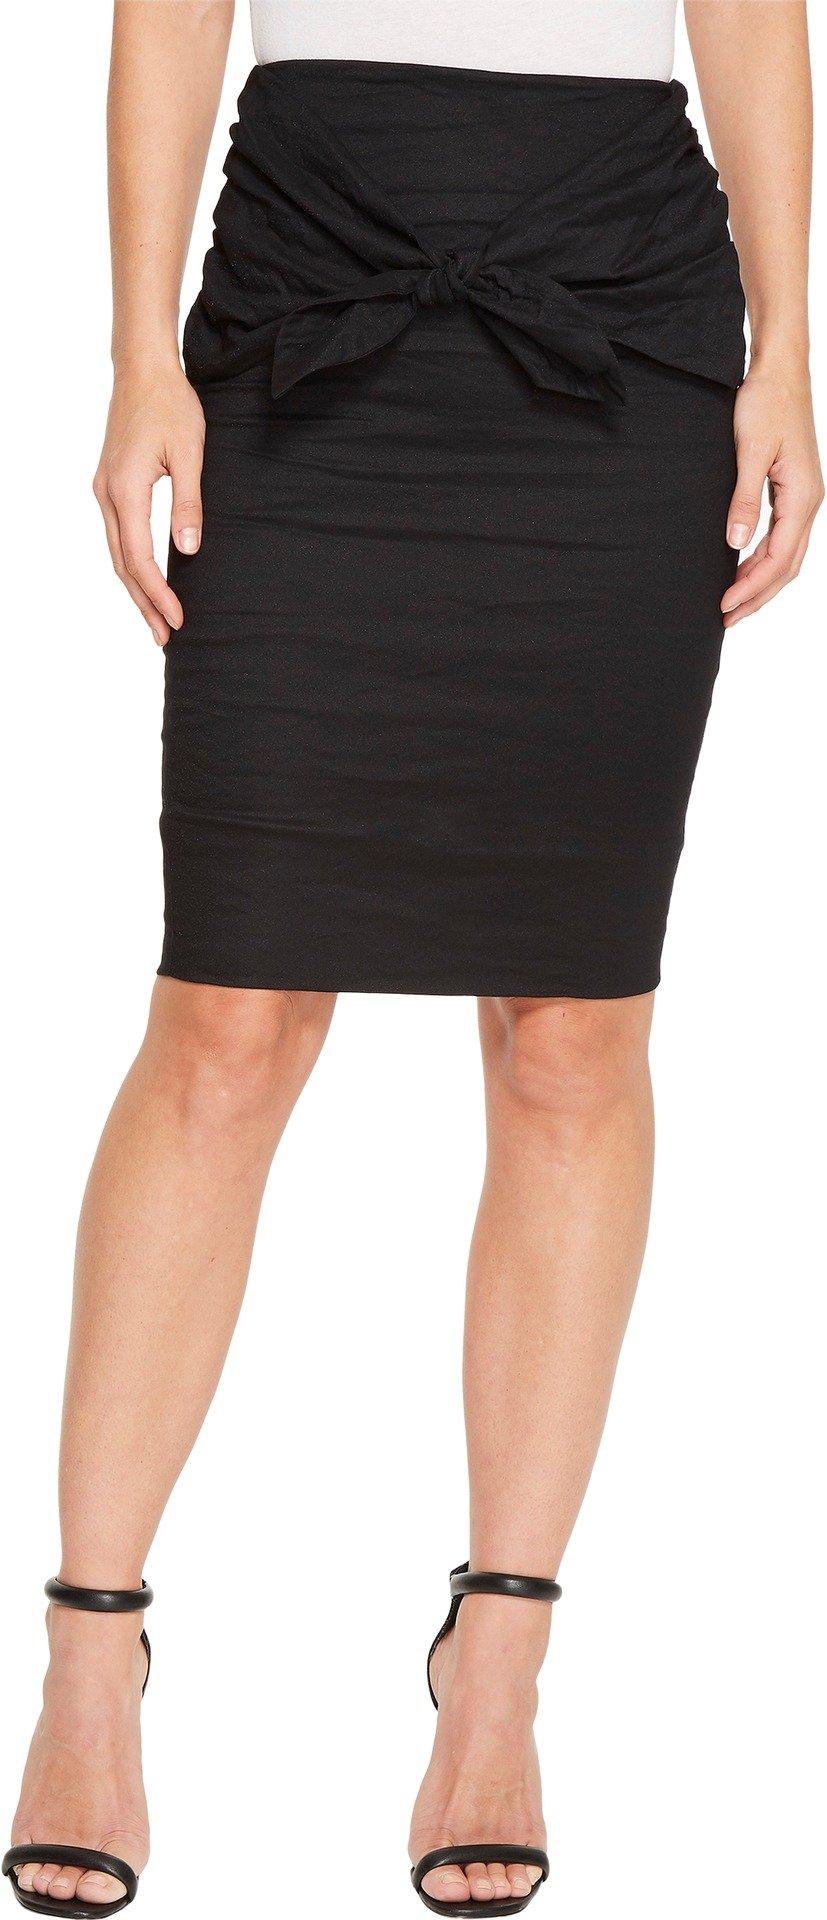 Nicole Miller Women's Brandi Cotton Metal Skirt Black 6